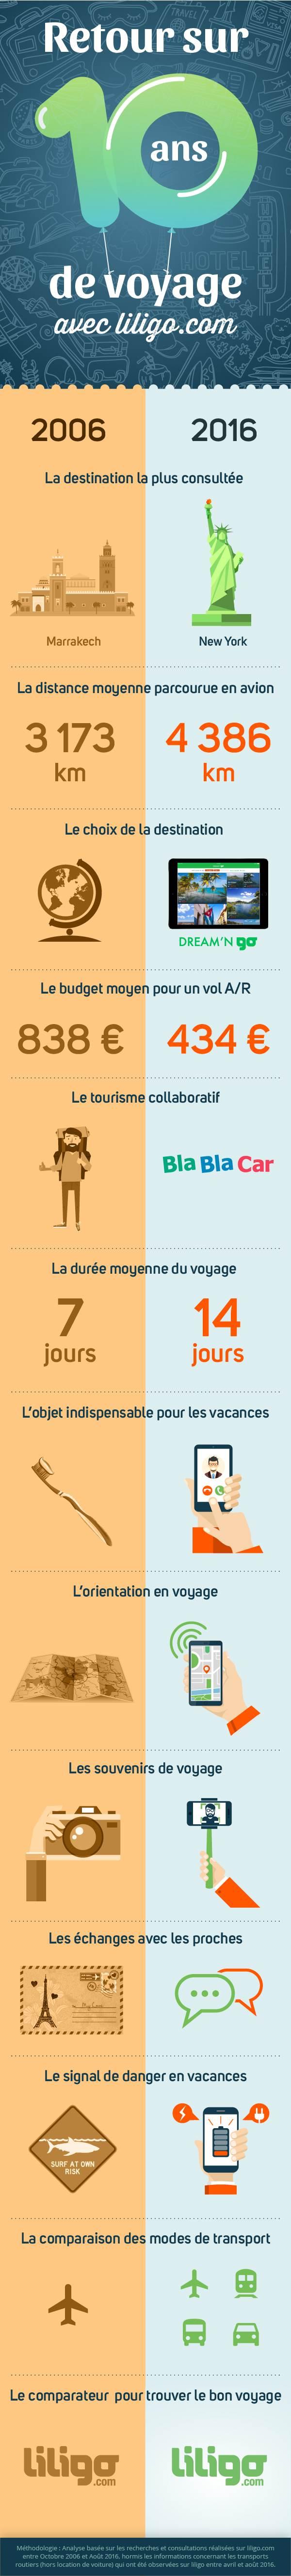 infographie_liligo_10_years